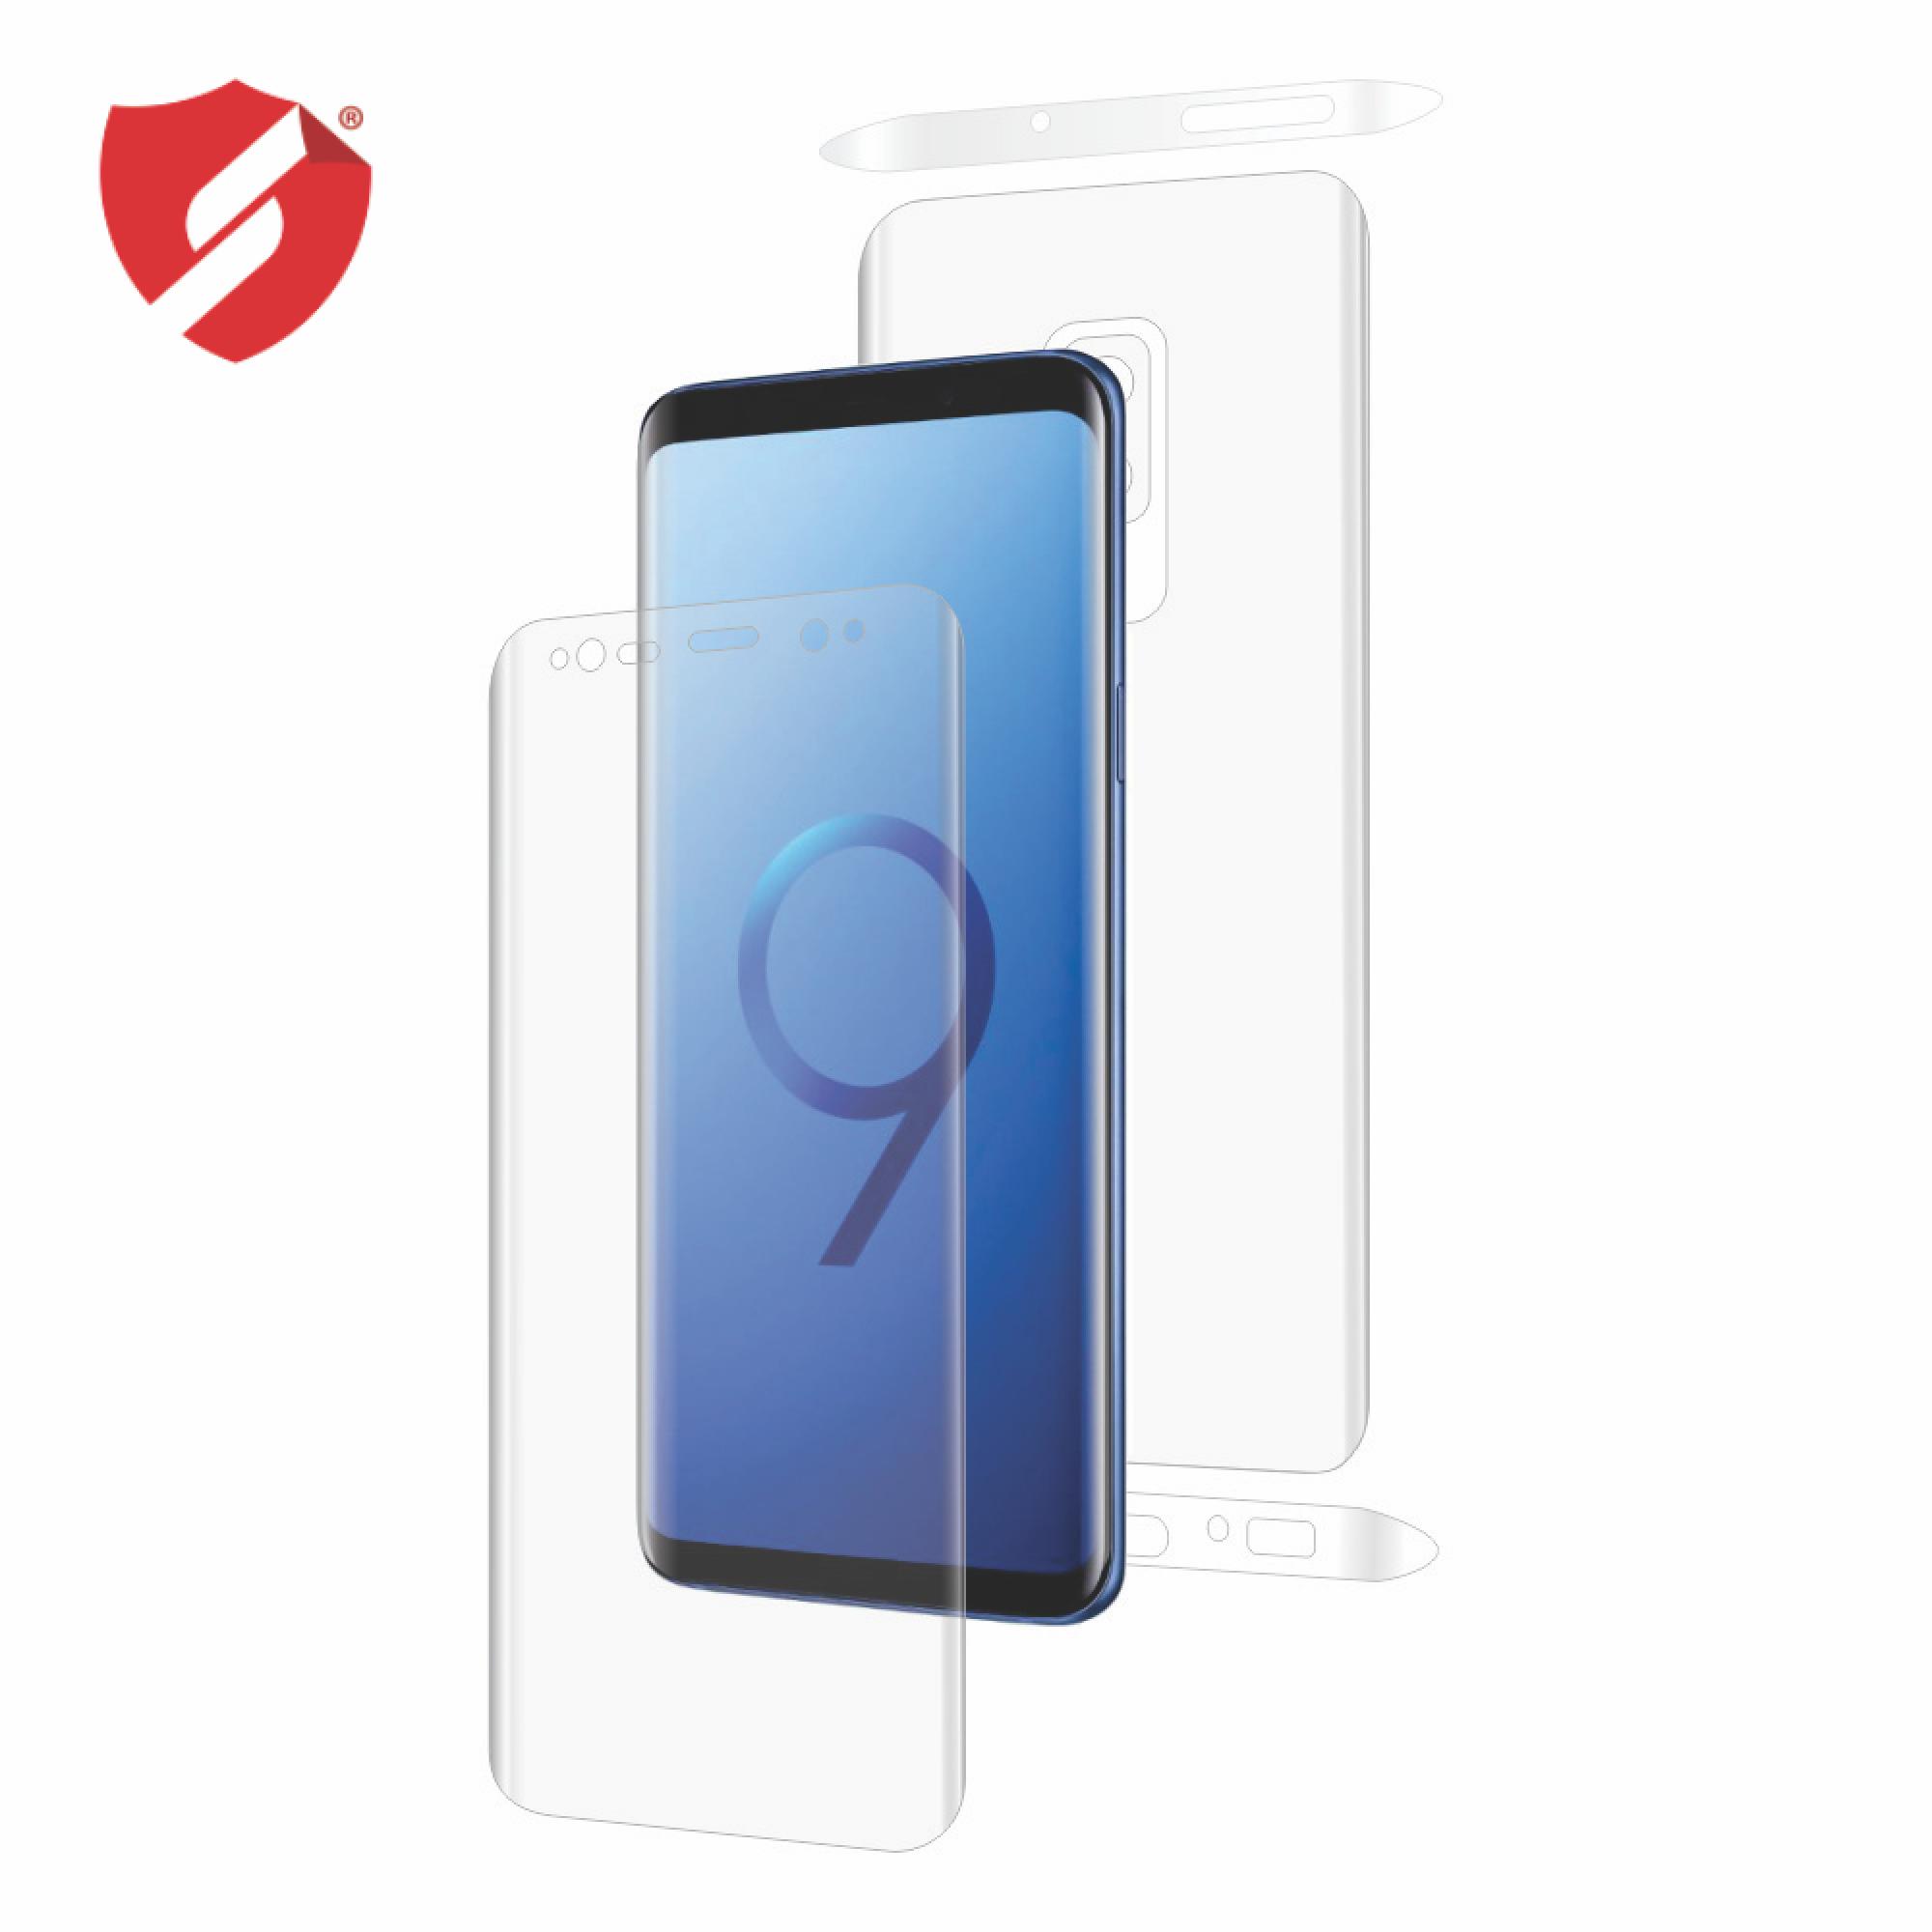 Folie de protectie Smart Protection Samsung Galaxy S9 Plus compatibila cu carcasa Flip Cover - fullbody - display + spate + laterale imagine